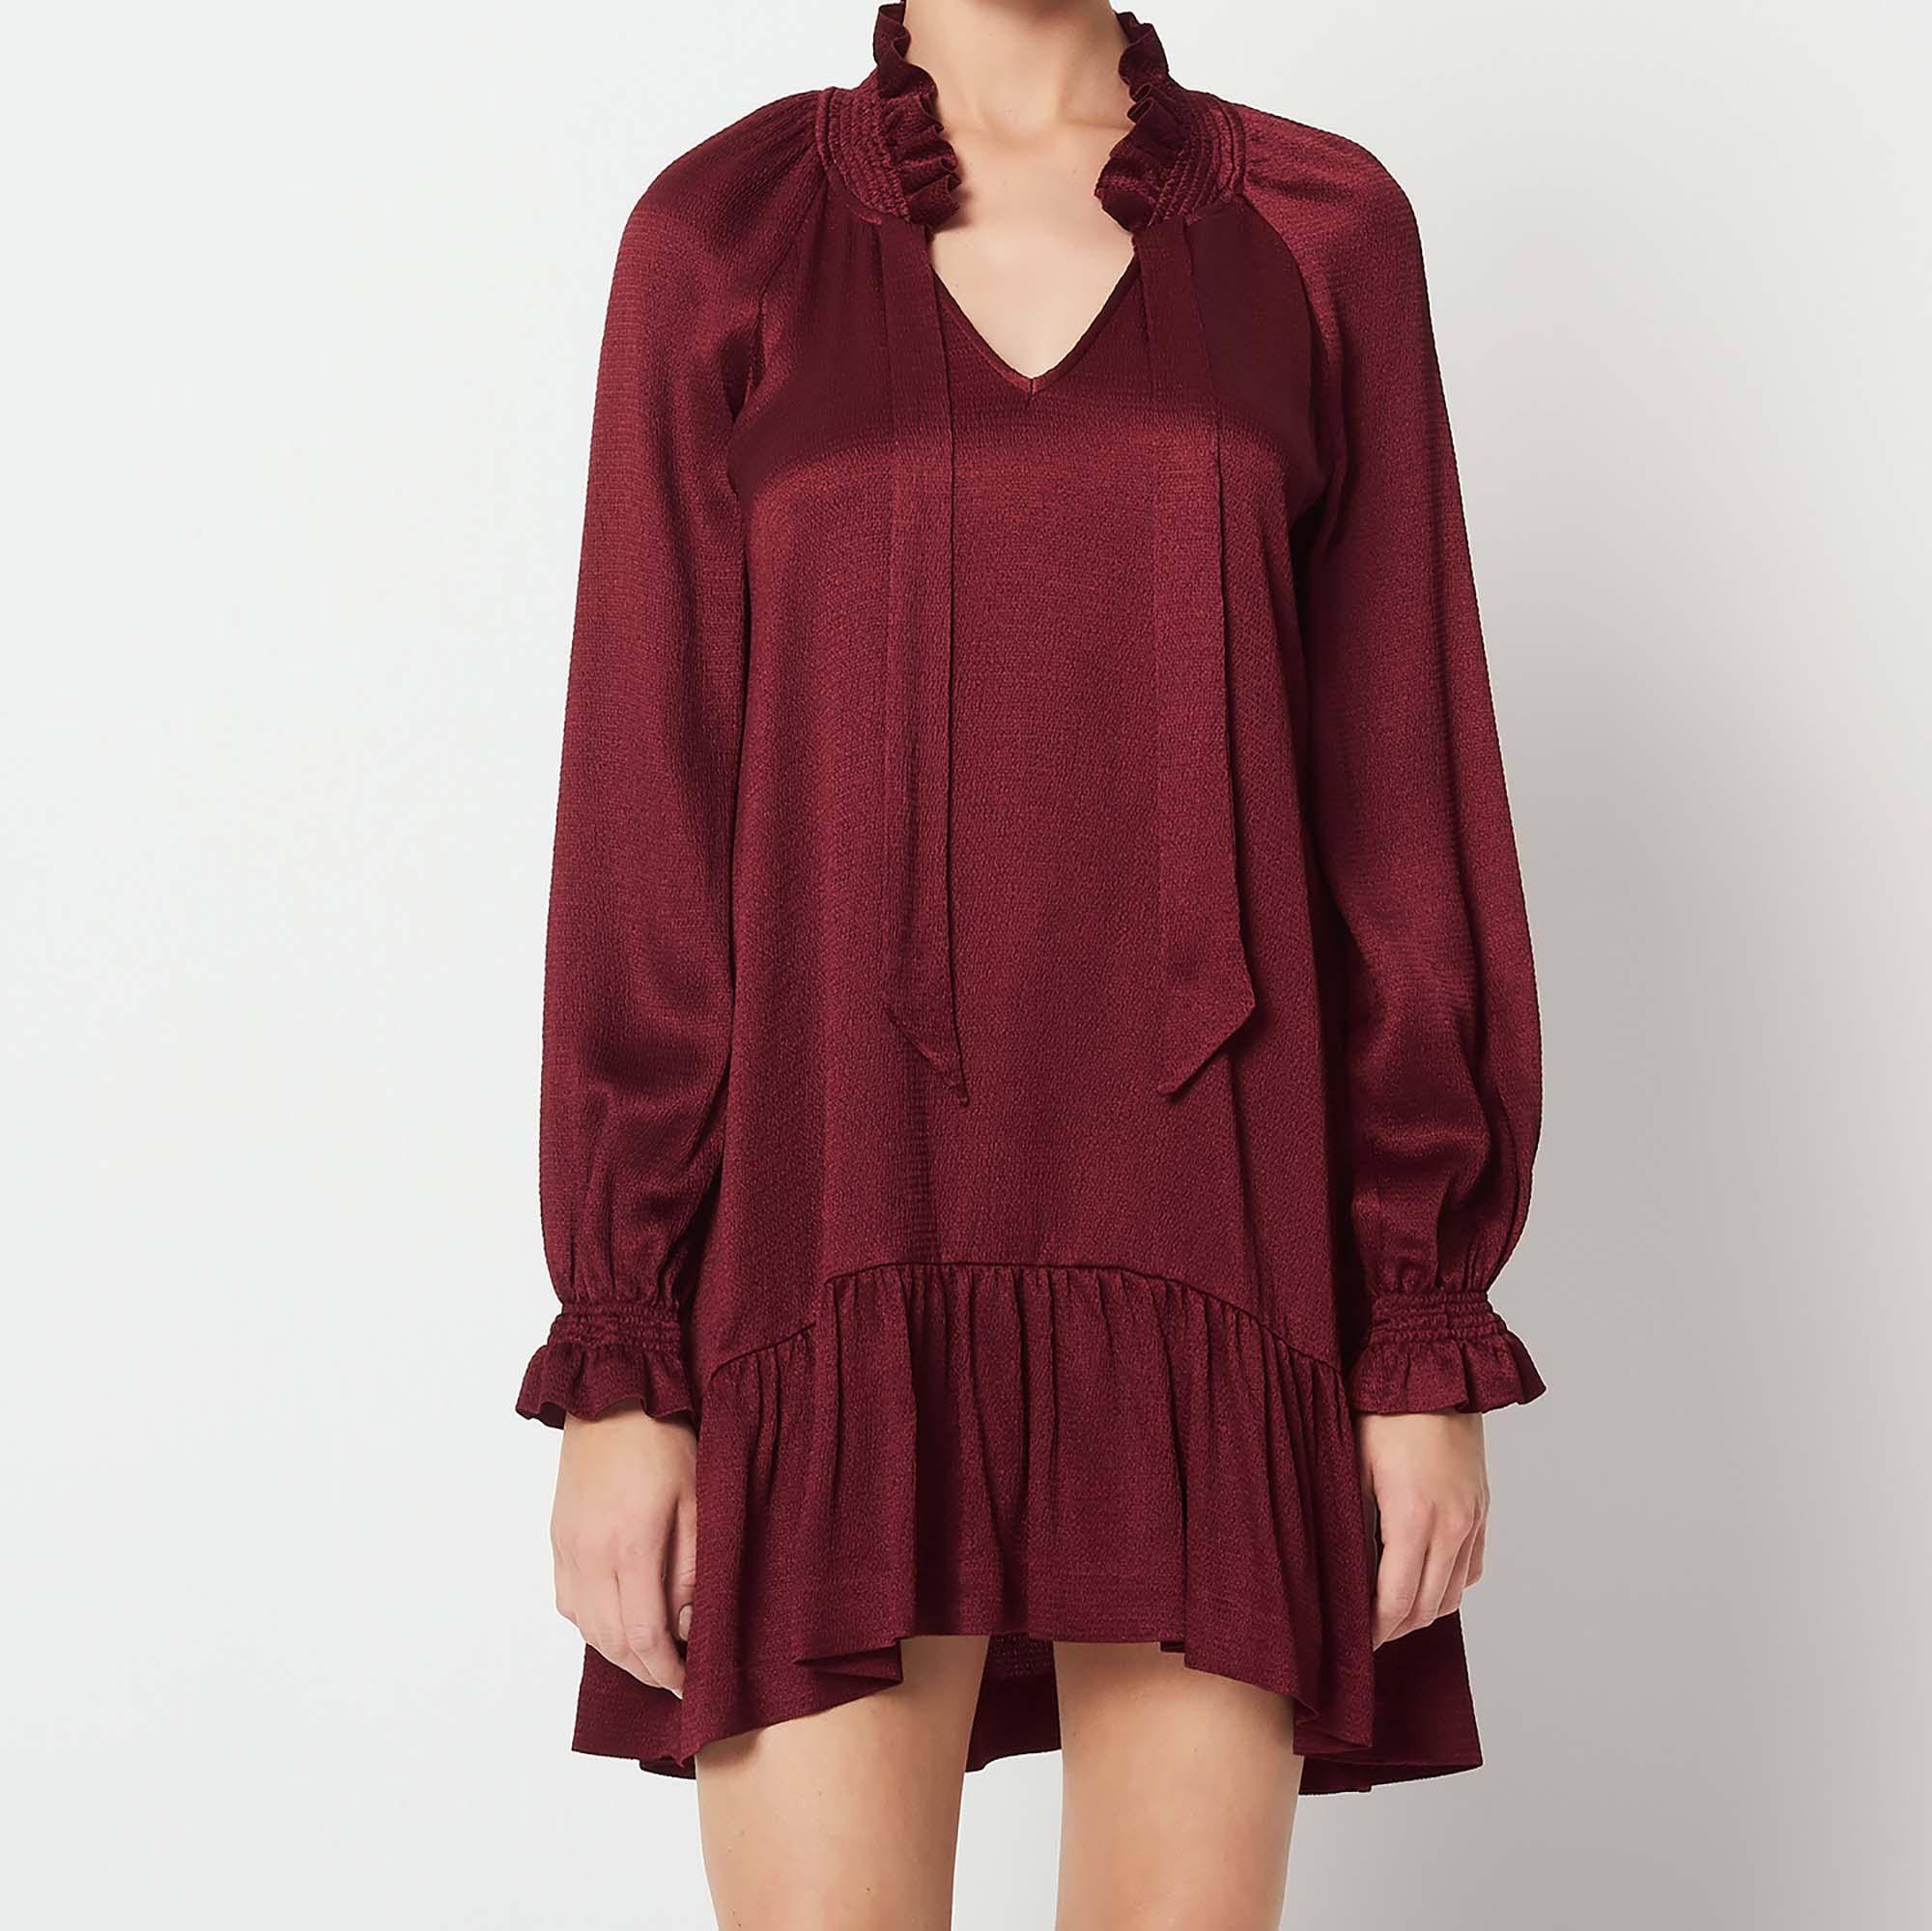 Short Dress With Little Ruffles Dresses Color Burgundy